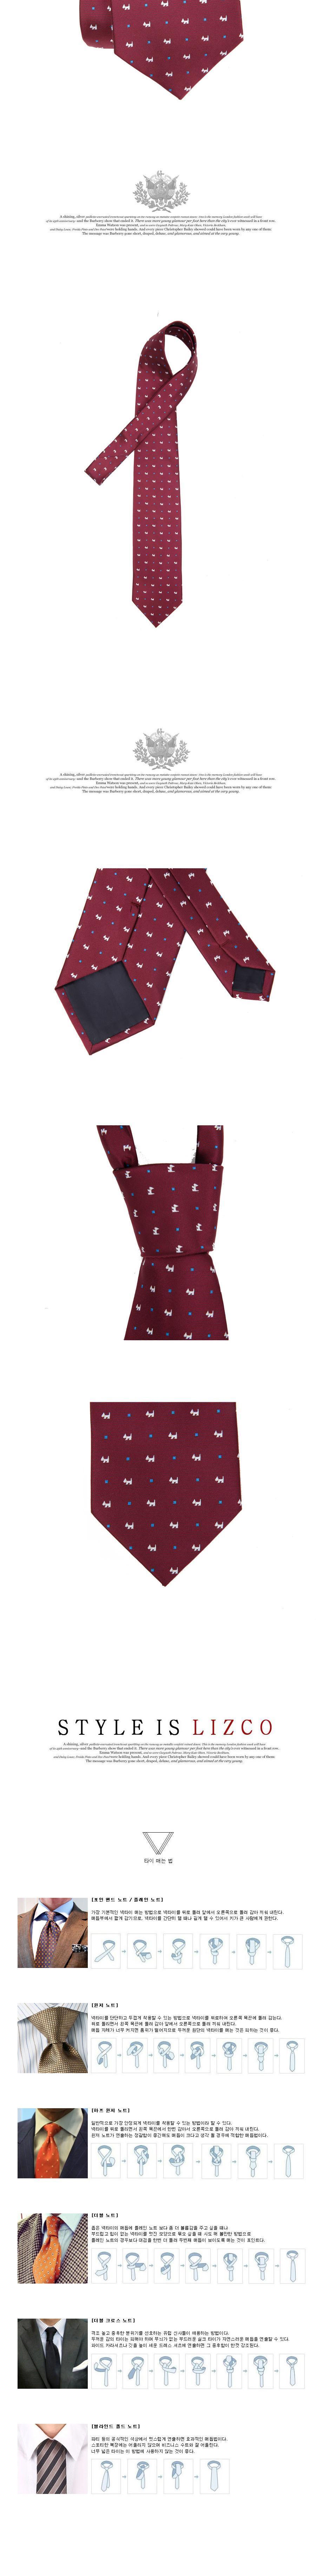 LTIE-045 도트강아지넥타이 (솔리드) 네이비.와인(와인칼라일시품절) 와이셔츠넥타이 남자넥타이 넥타이선물 넥타이 패션넥타이 솔리드넥타이 패션잡화 패션소품 타이 정장넥타이